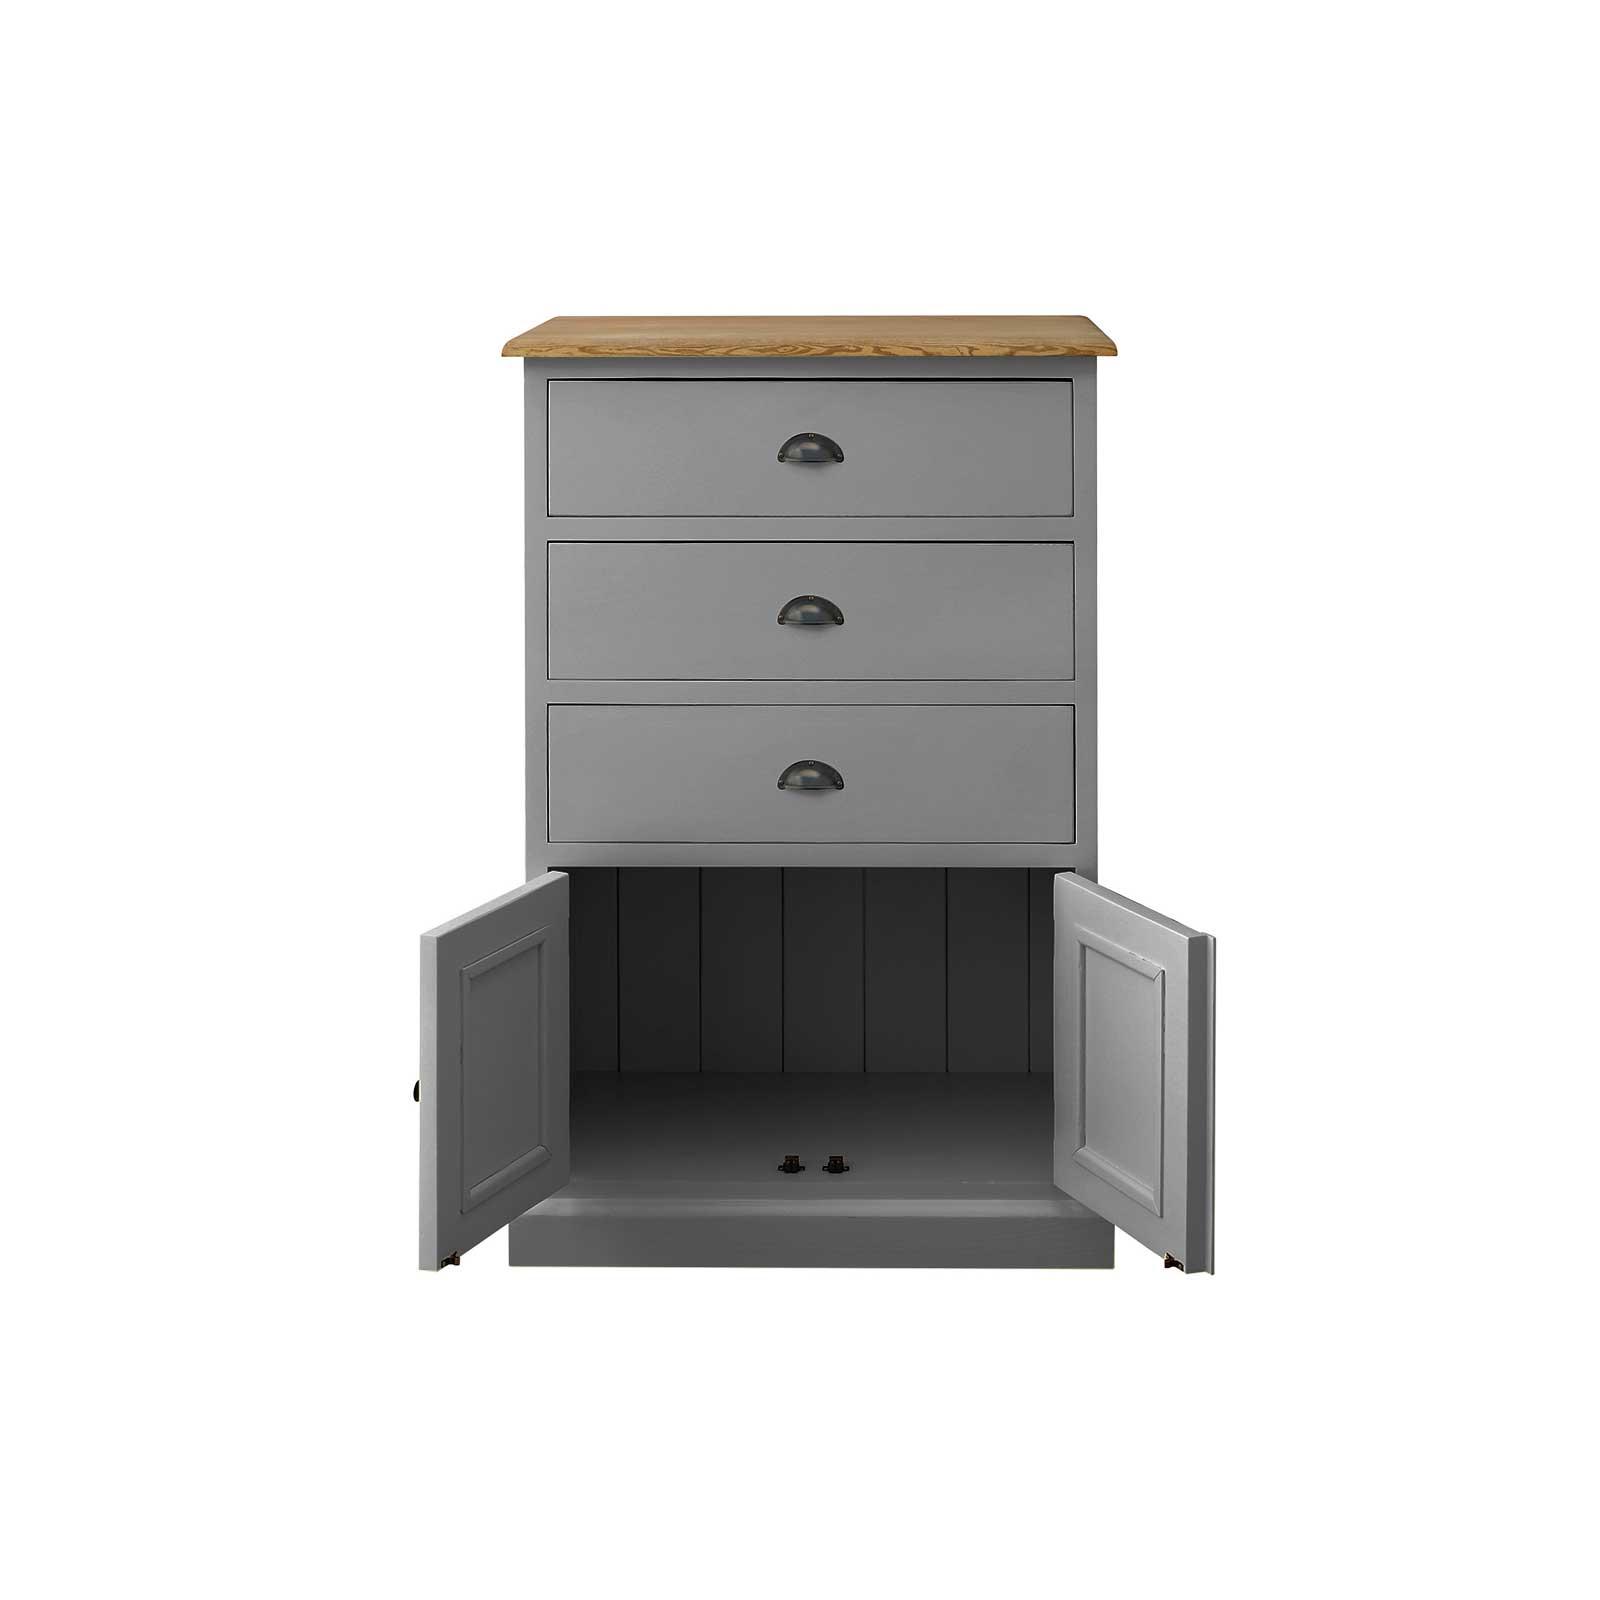 Soho Dark Grey Painted 3 Drawer Cabinet_2